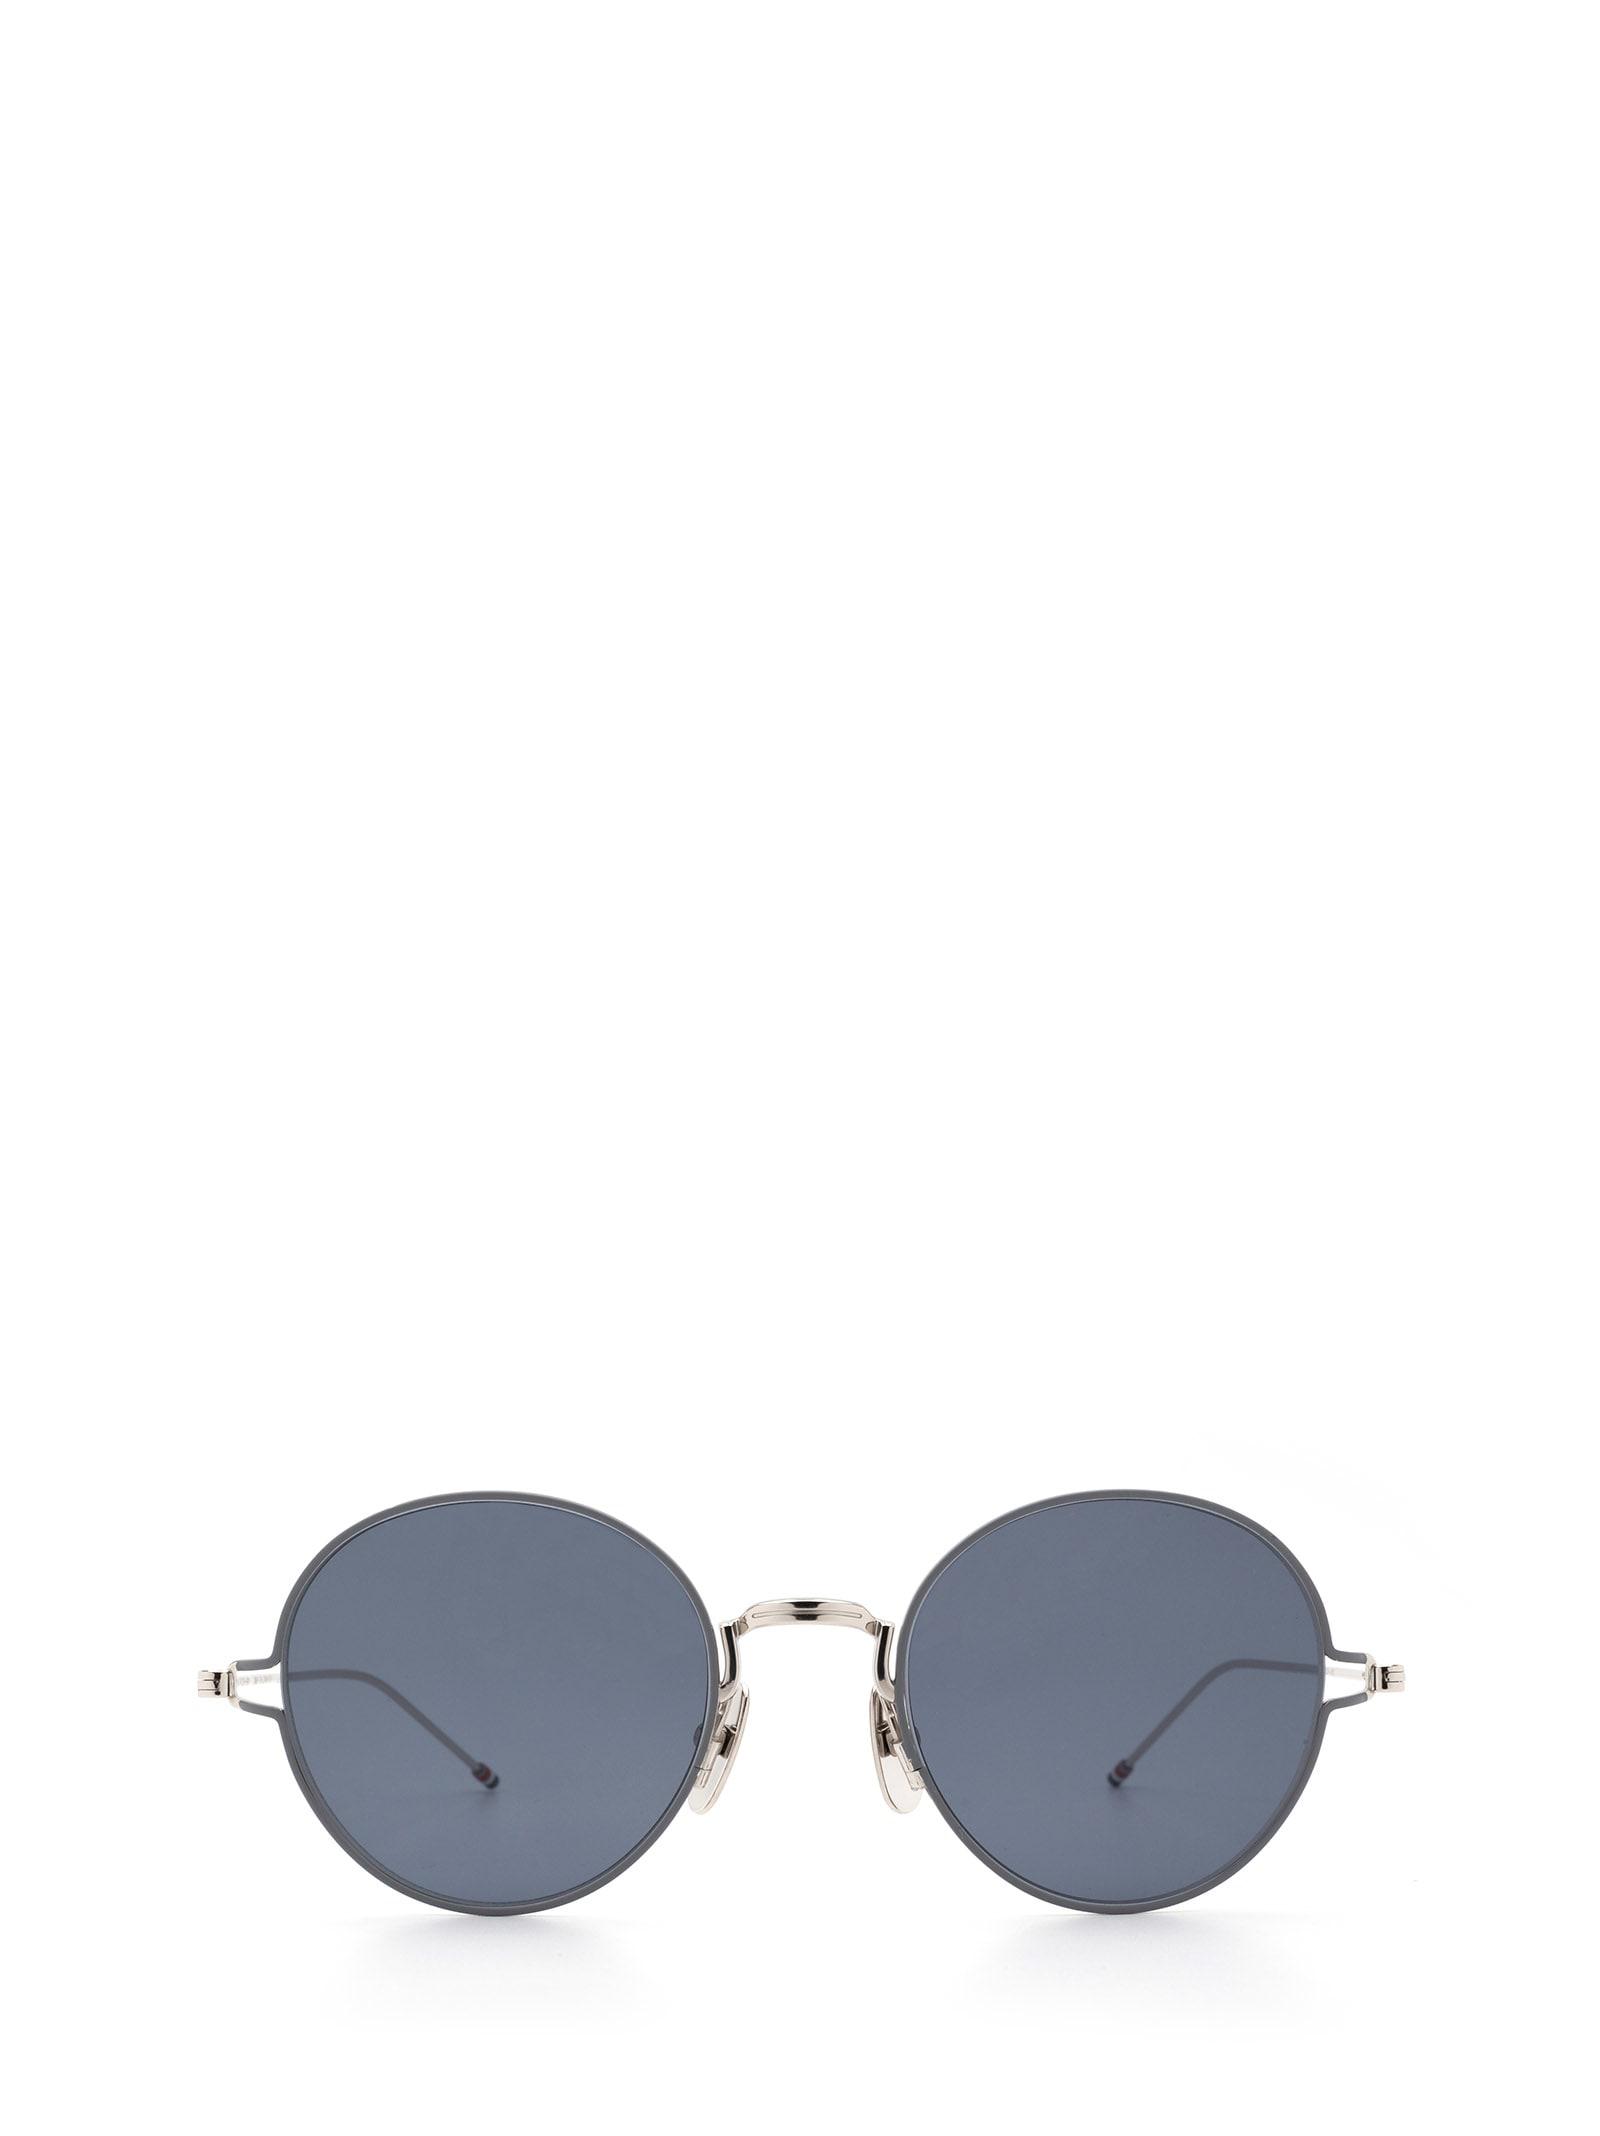 Thom Browne Thom Browne Tbs915 Slv-gry Sunglasses